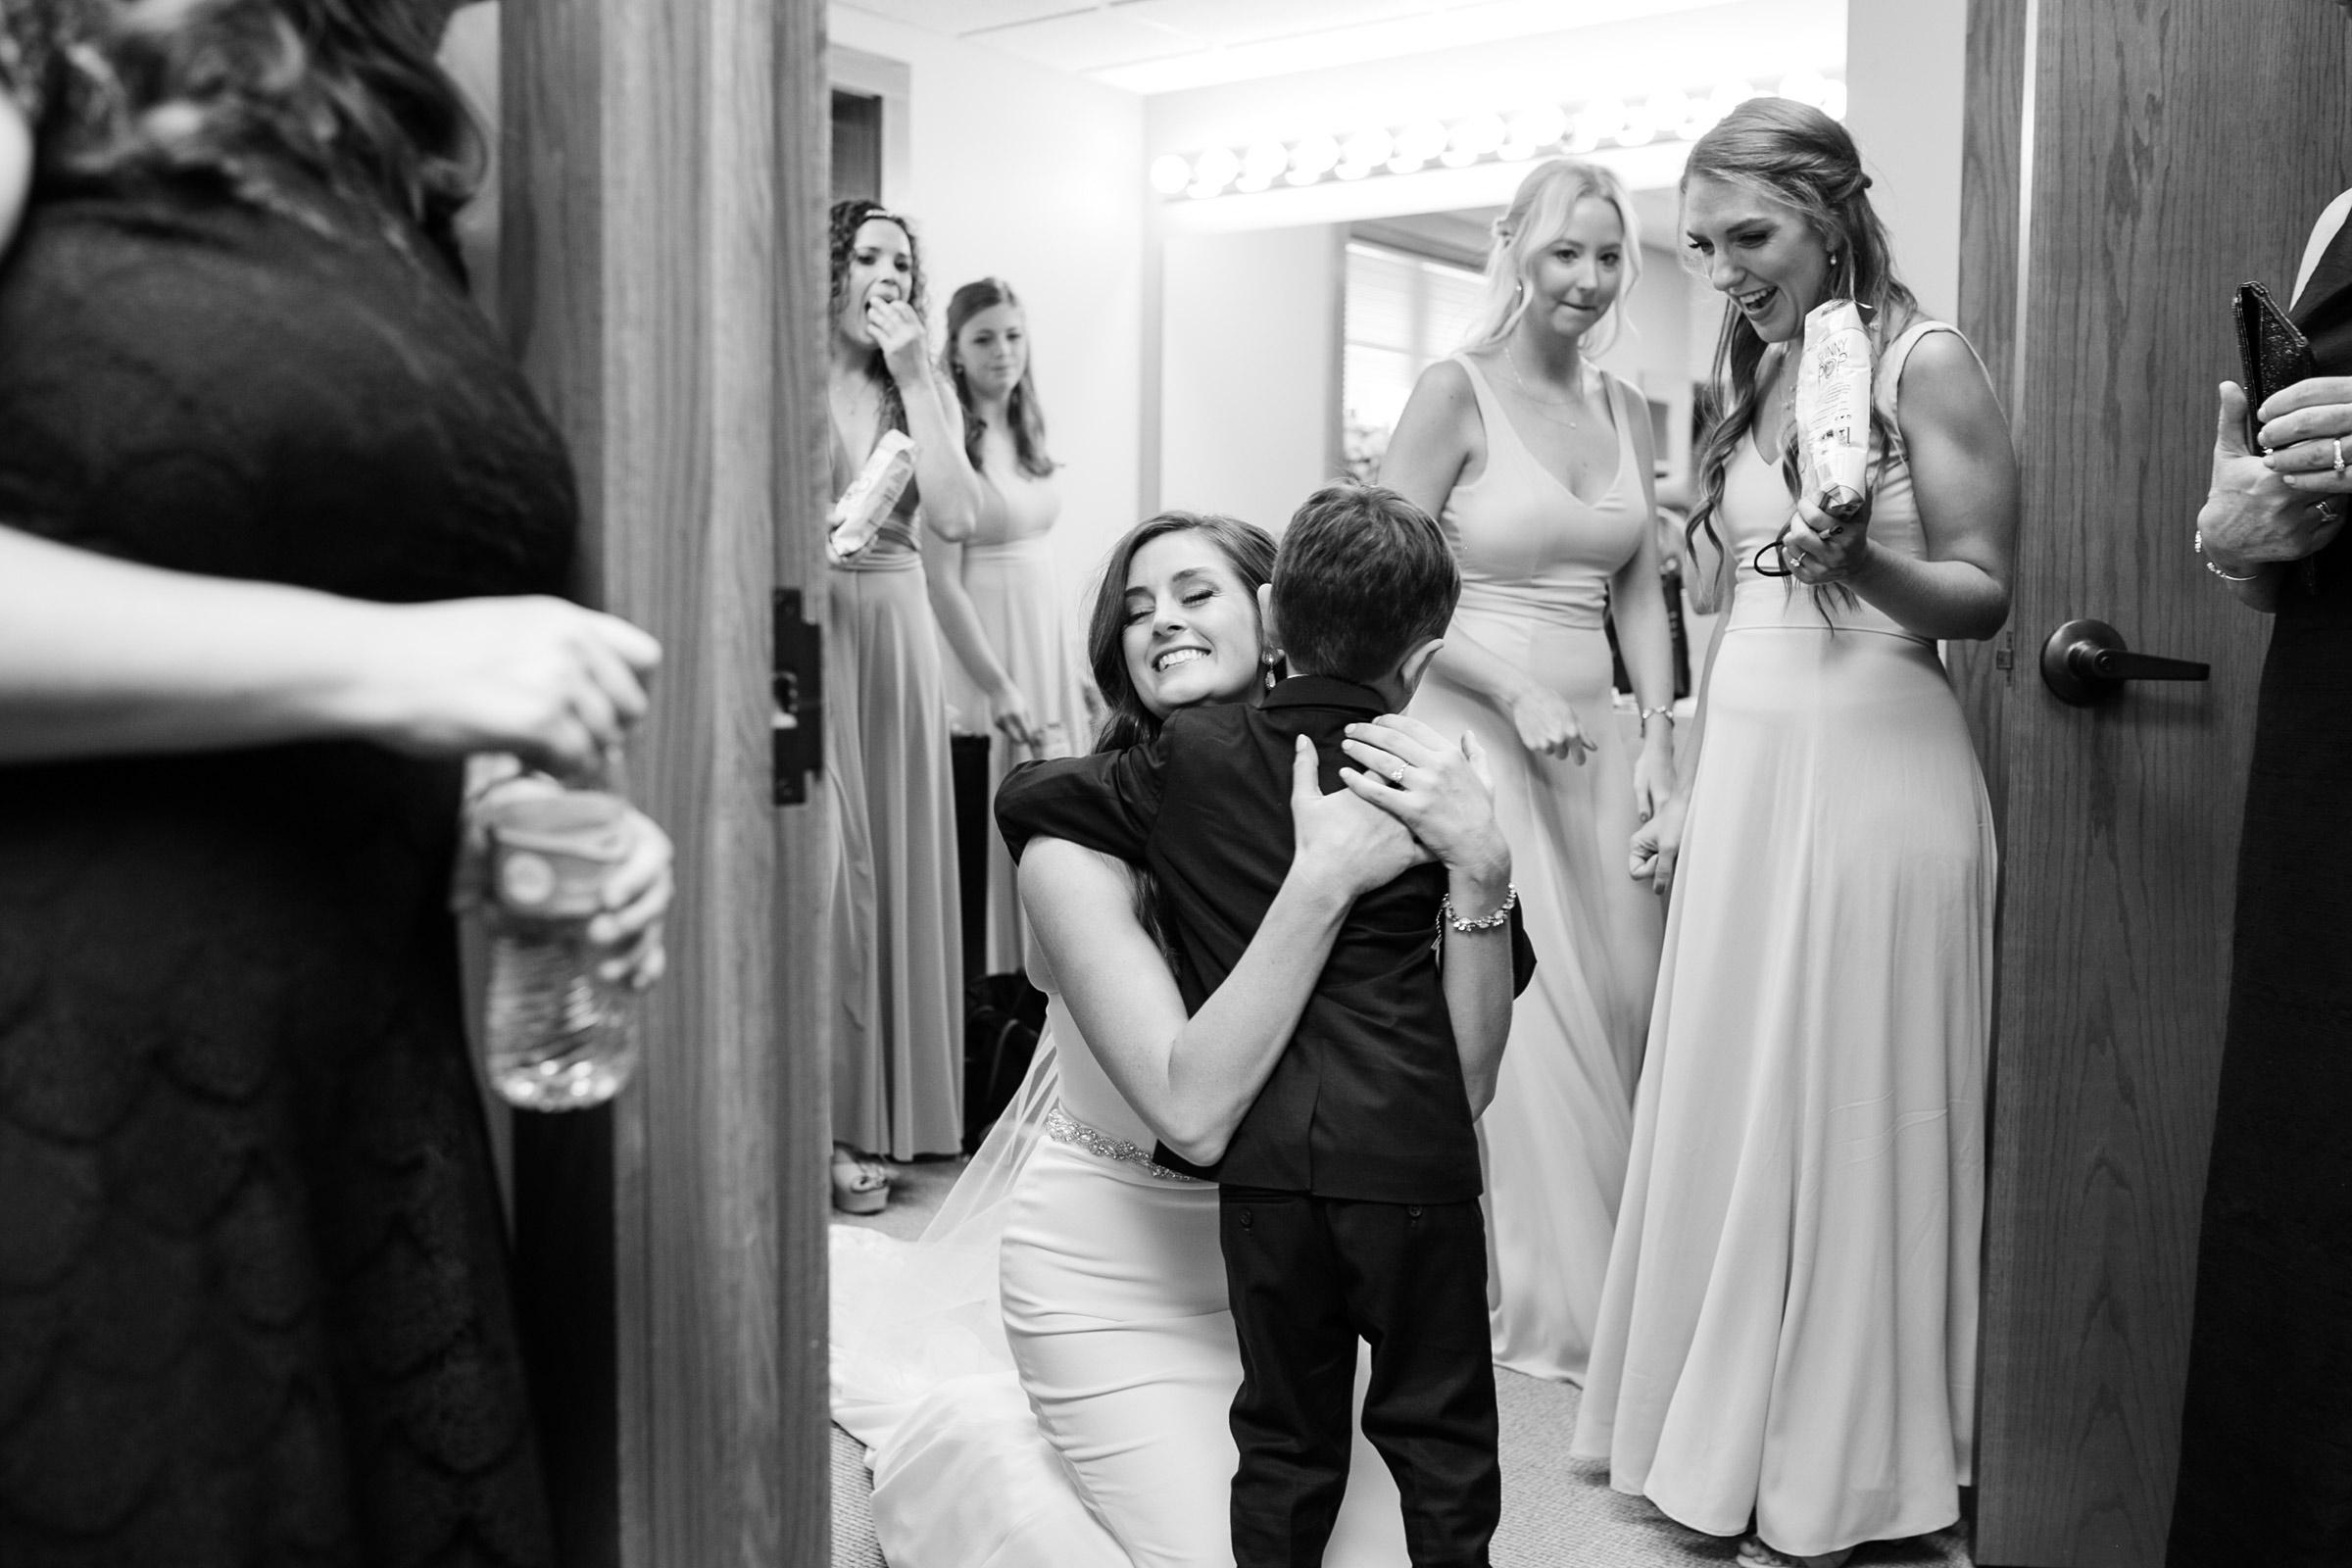 mr-mrs-hull-bride-hugging-ring-bearer-desmoines-iowa-raelyn-ramey-photography-282.jpg